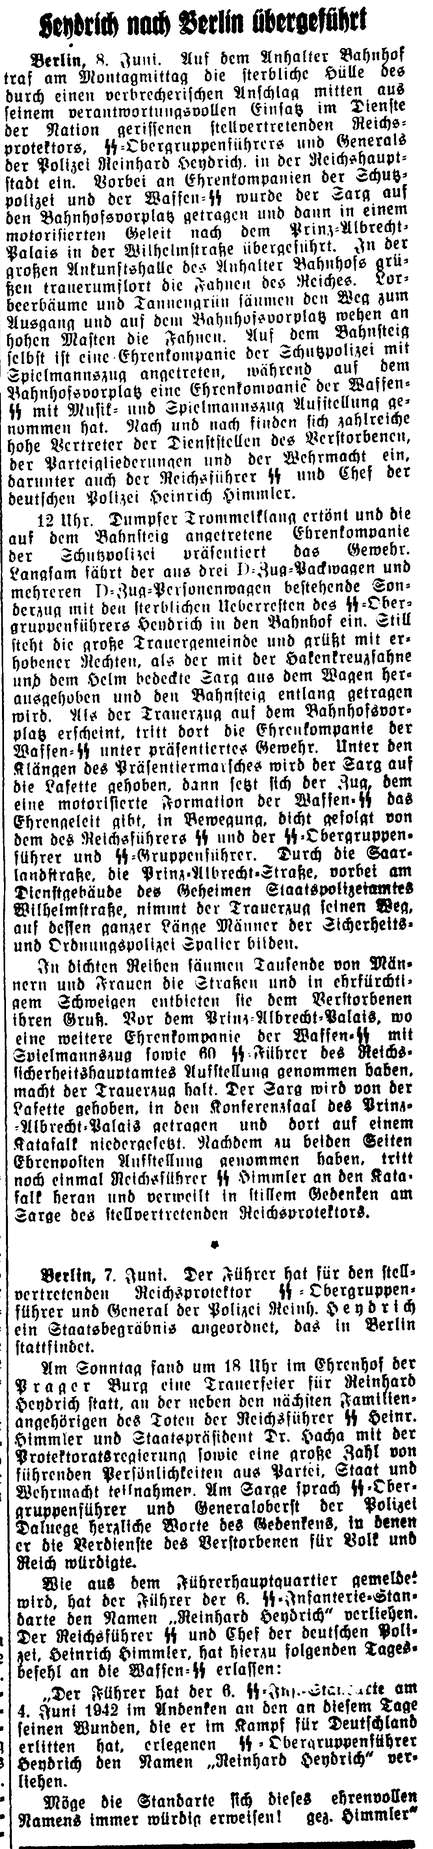 https://i2.wp.com/de.metapedia.org/m/images/5/52/Frz.1942-06-08.01_%28%C3%9Cberf%C3%BChrung_Heydrich%29.jpg